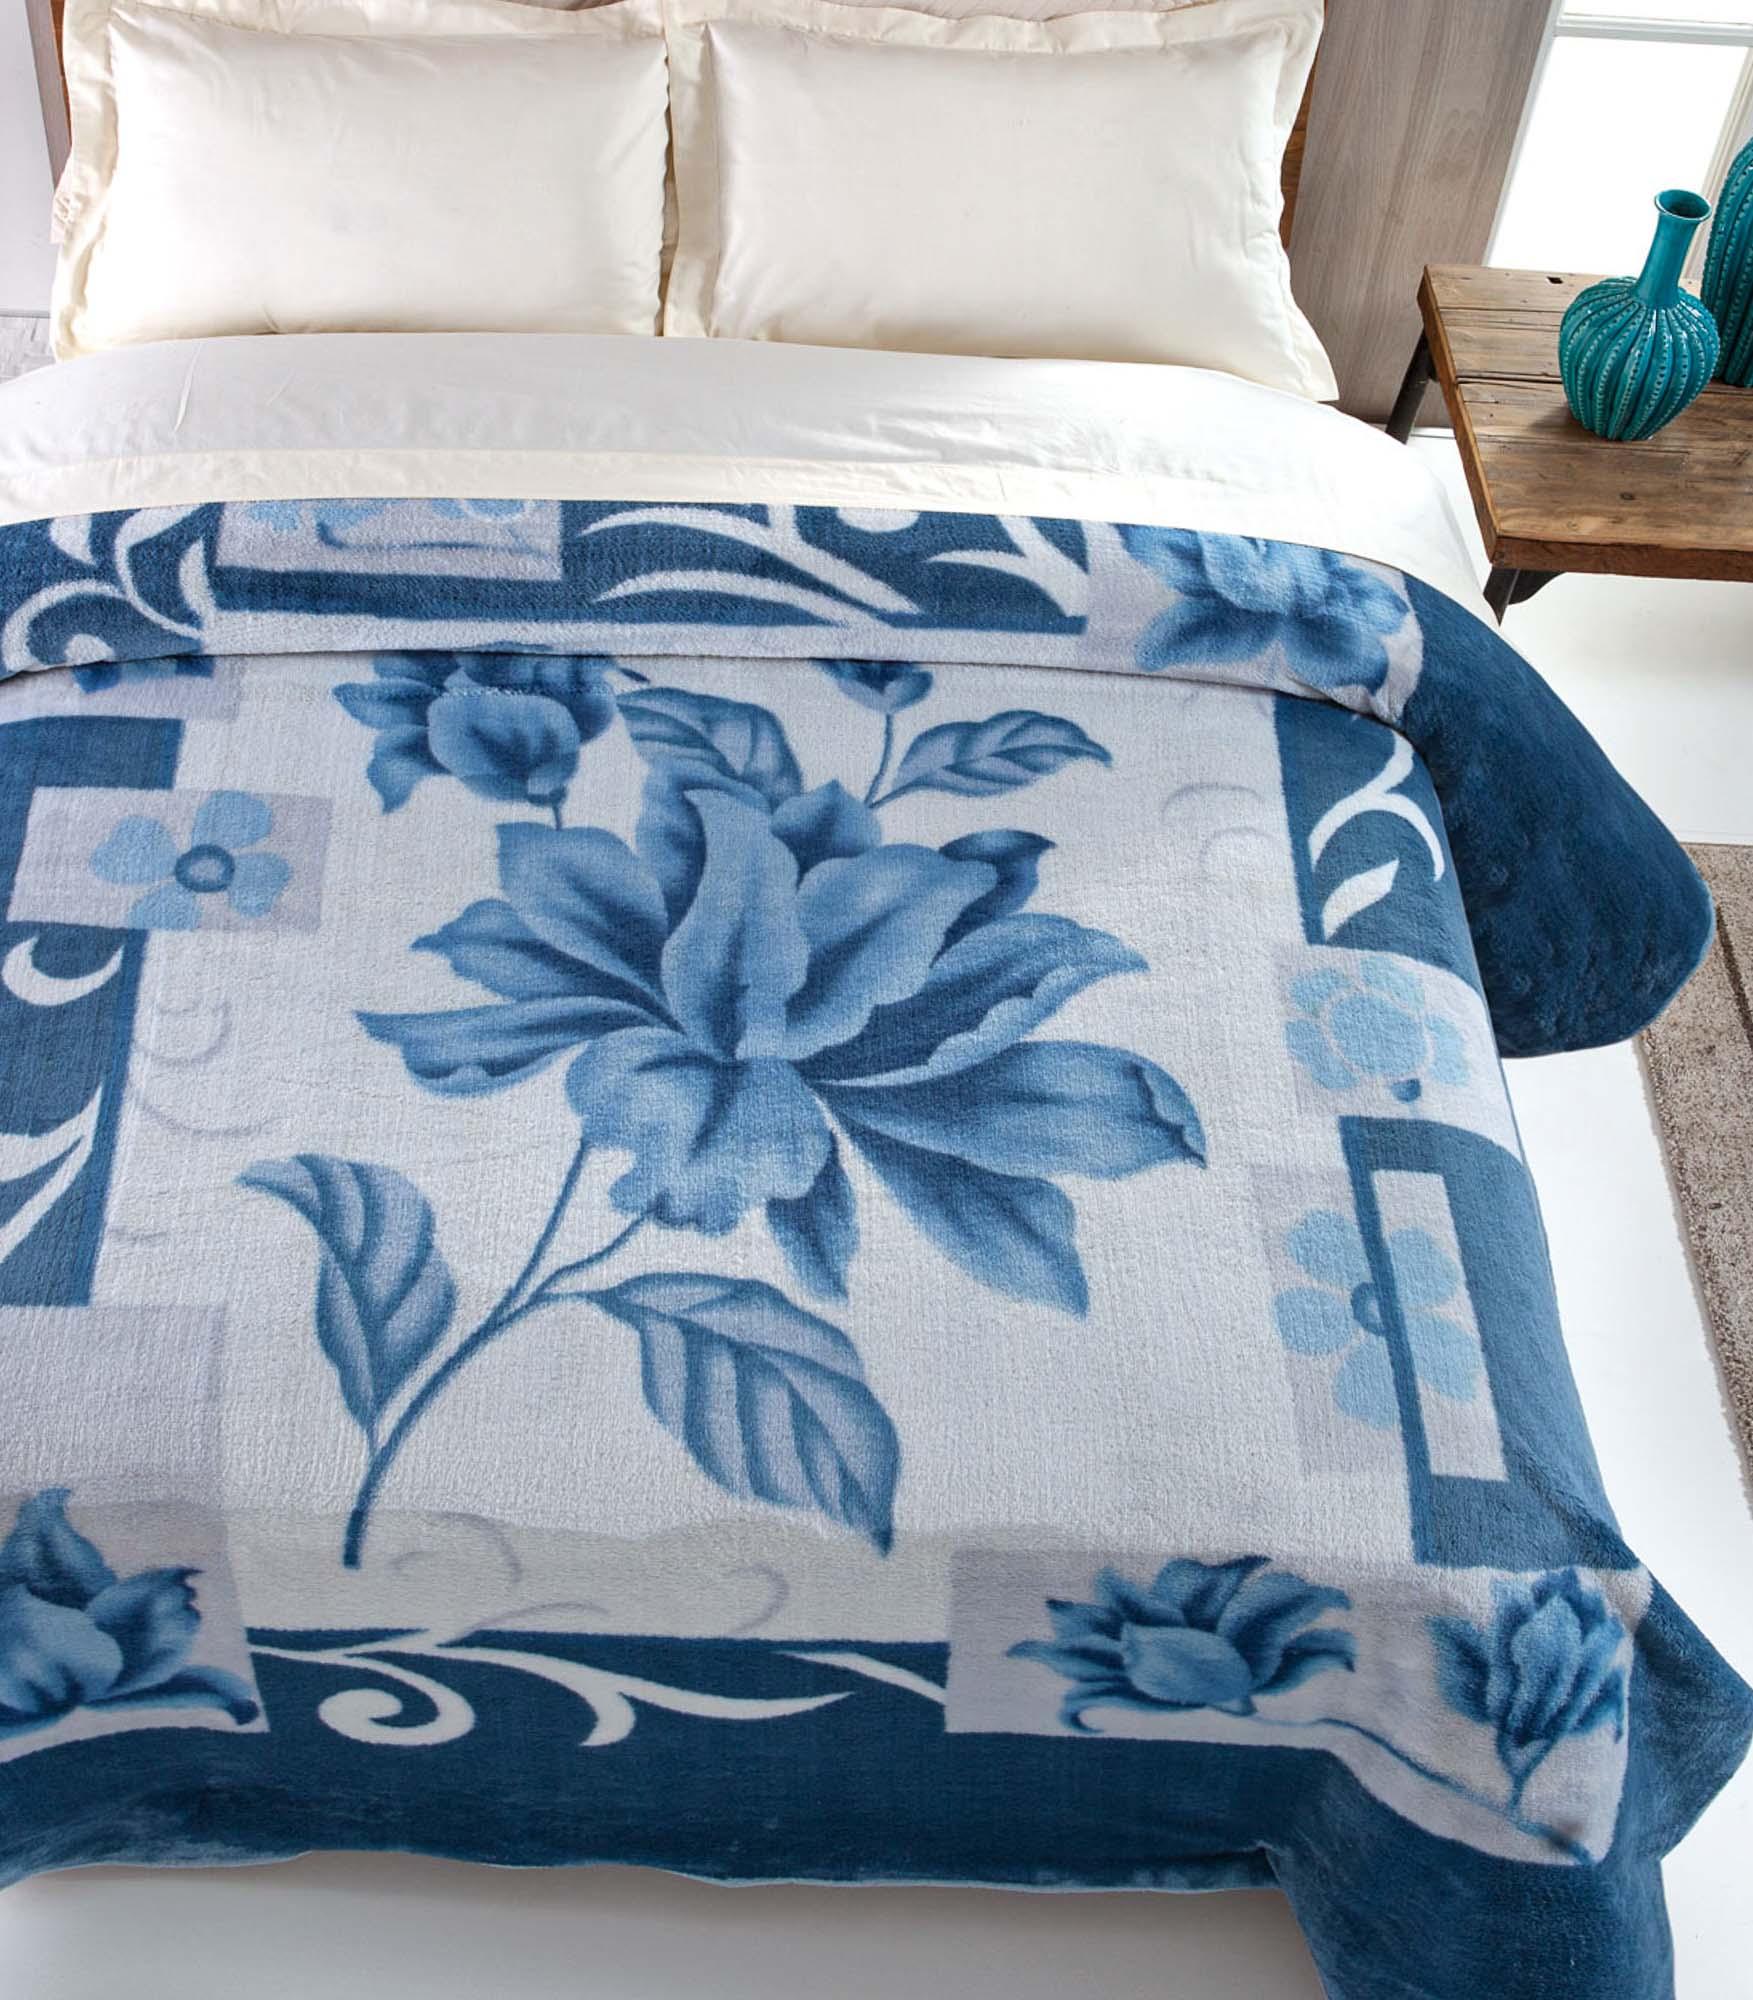 Cobertor Jolitex Kyor Plus King 2,20x2,40m Soft Malbec Azul